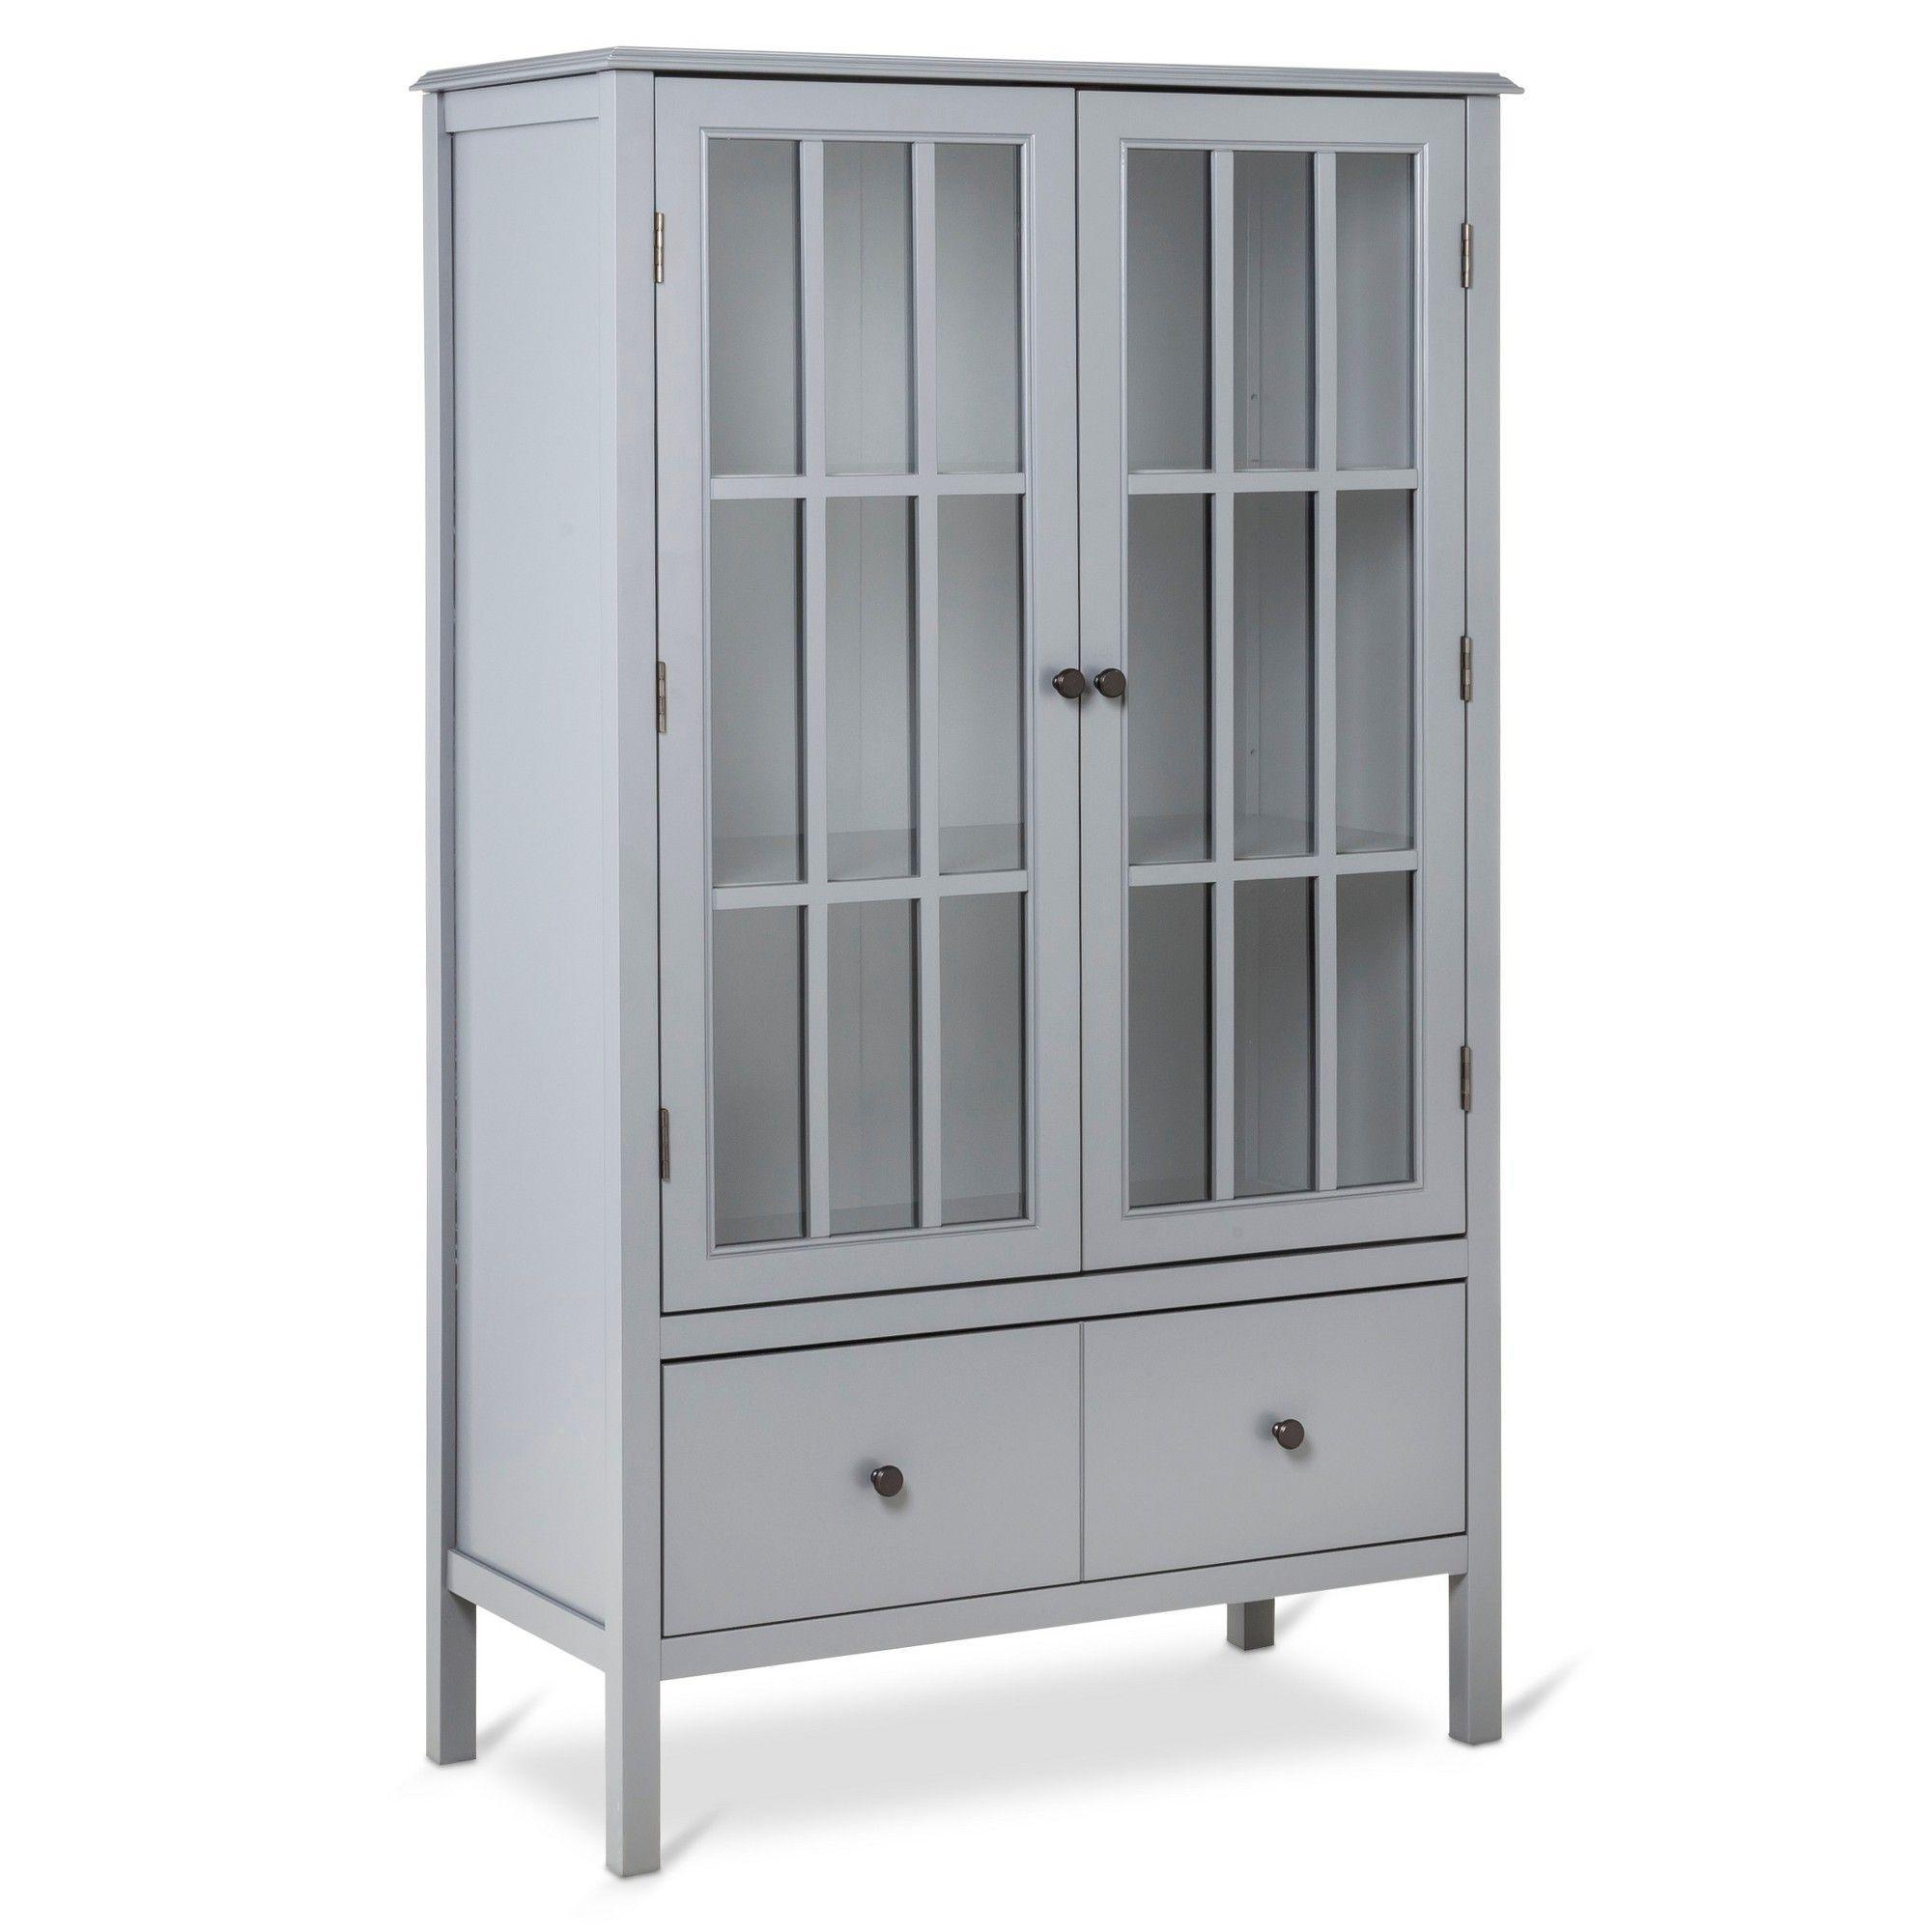 Windham Tall Storage with Drawer Gray Threshold